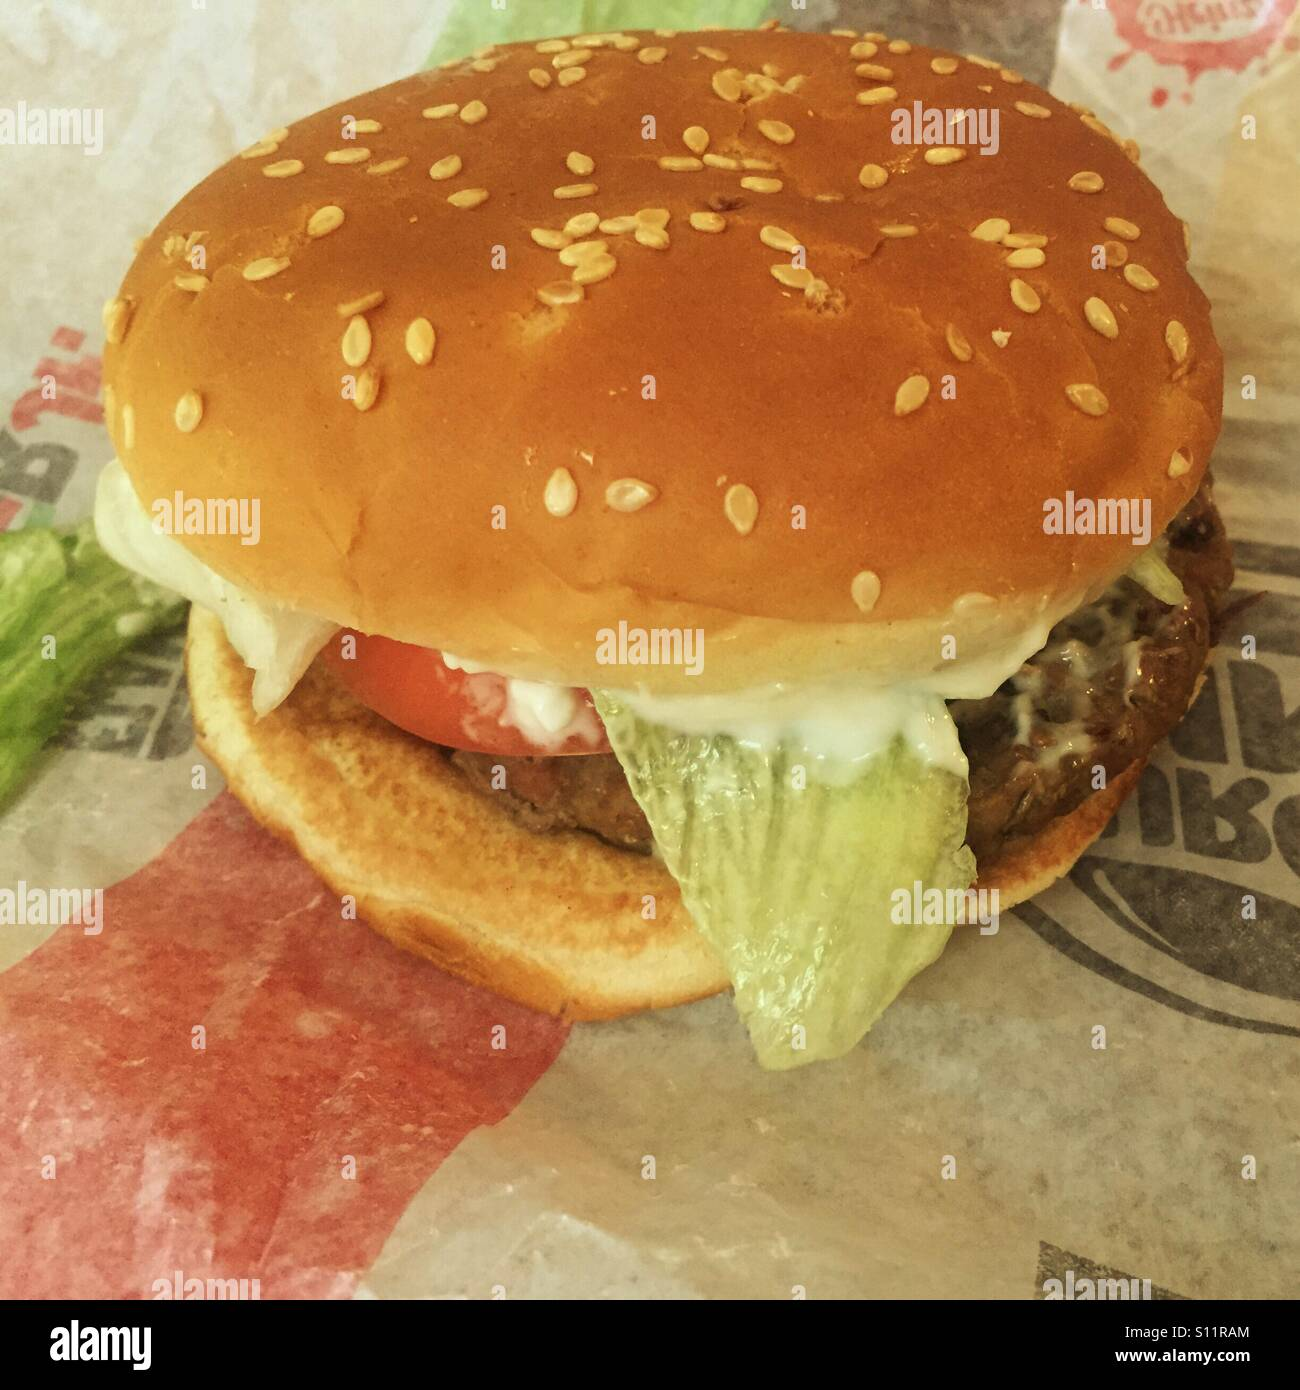 Burger King Whopper Jr Stock Photo: 310441564 - Alamy